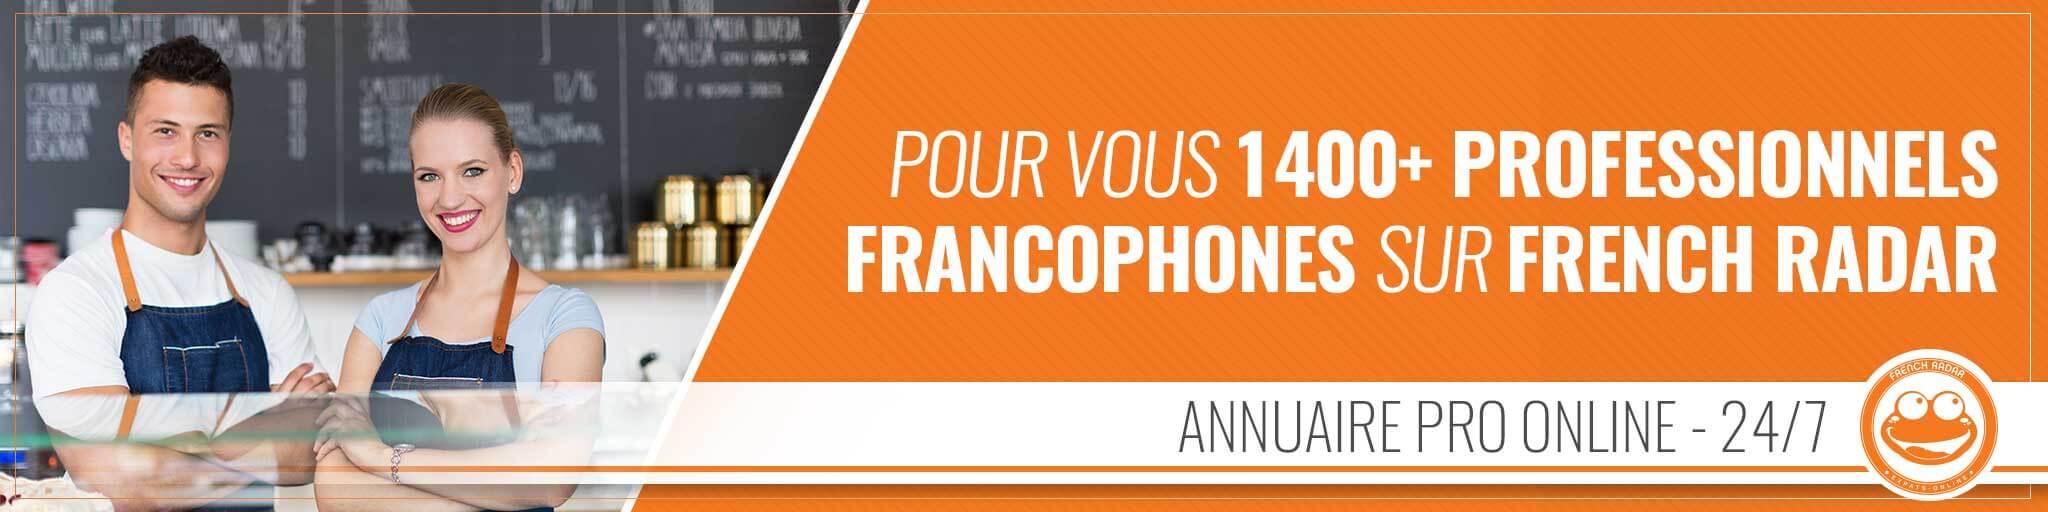 French Radar : Annuaire Pro